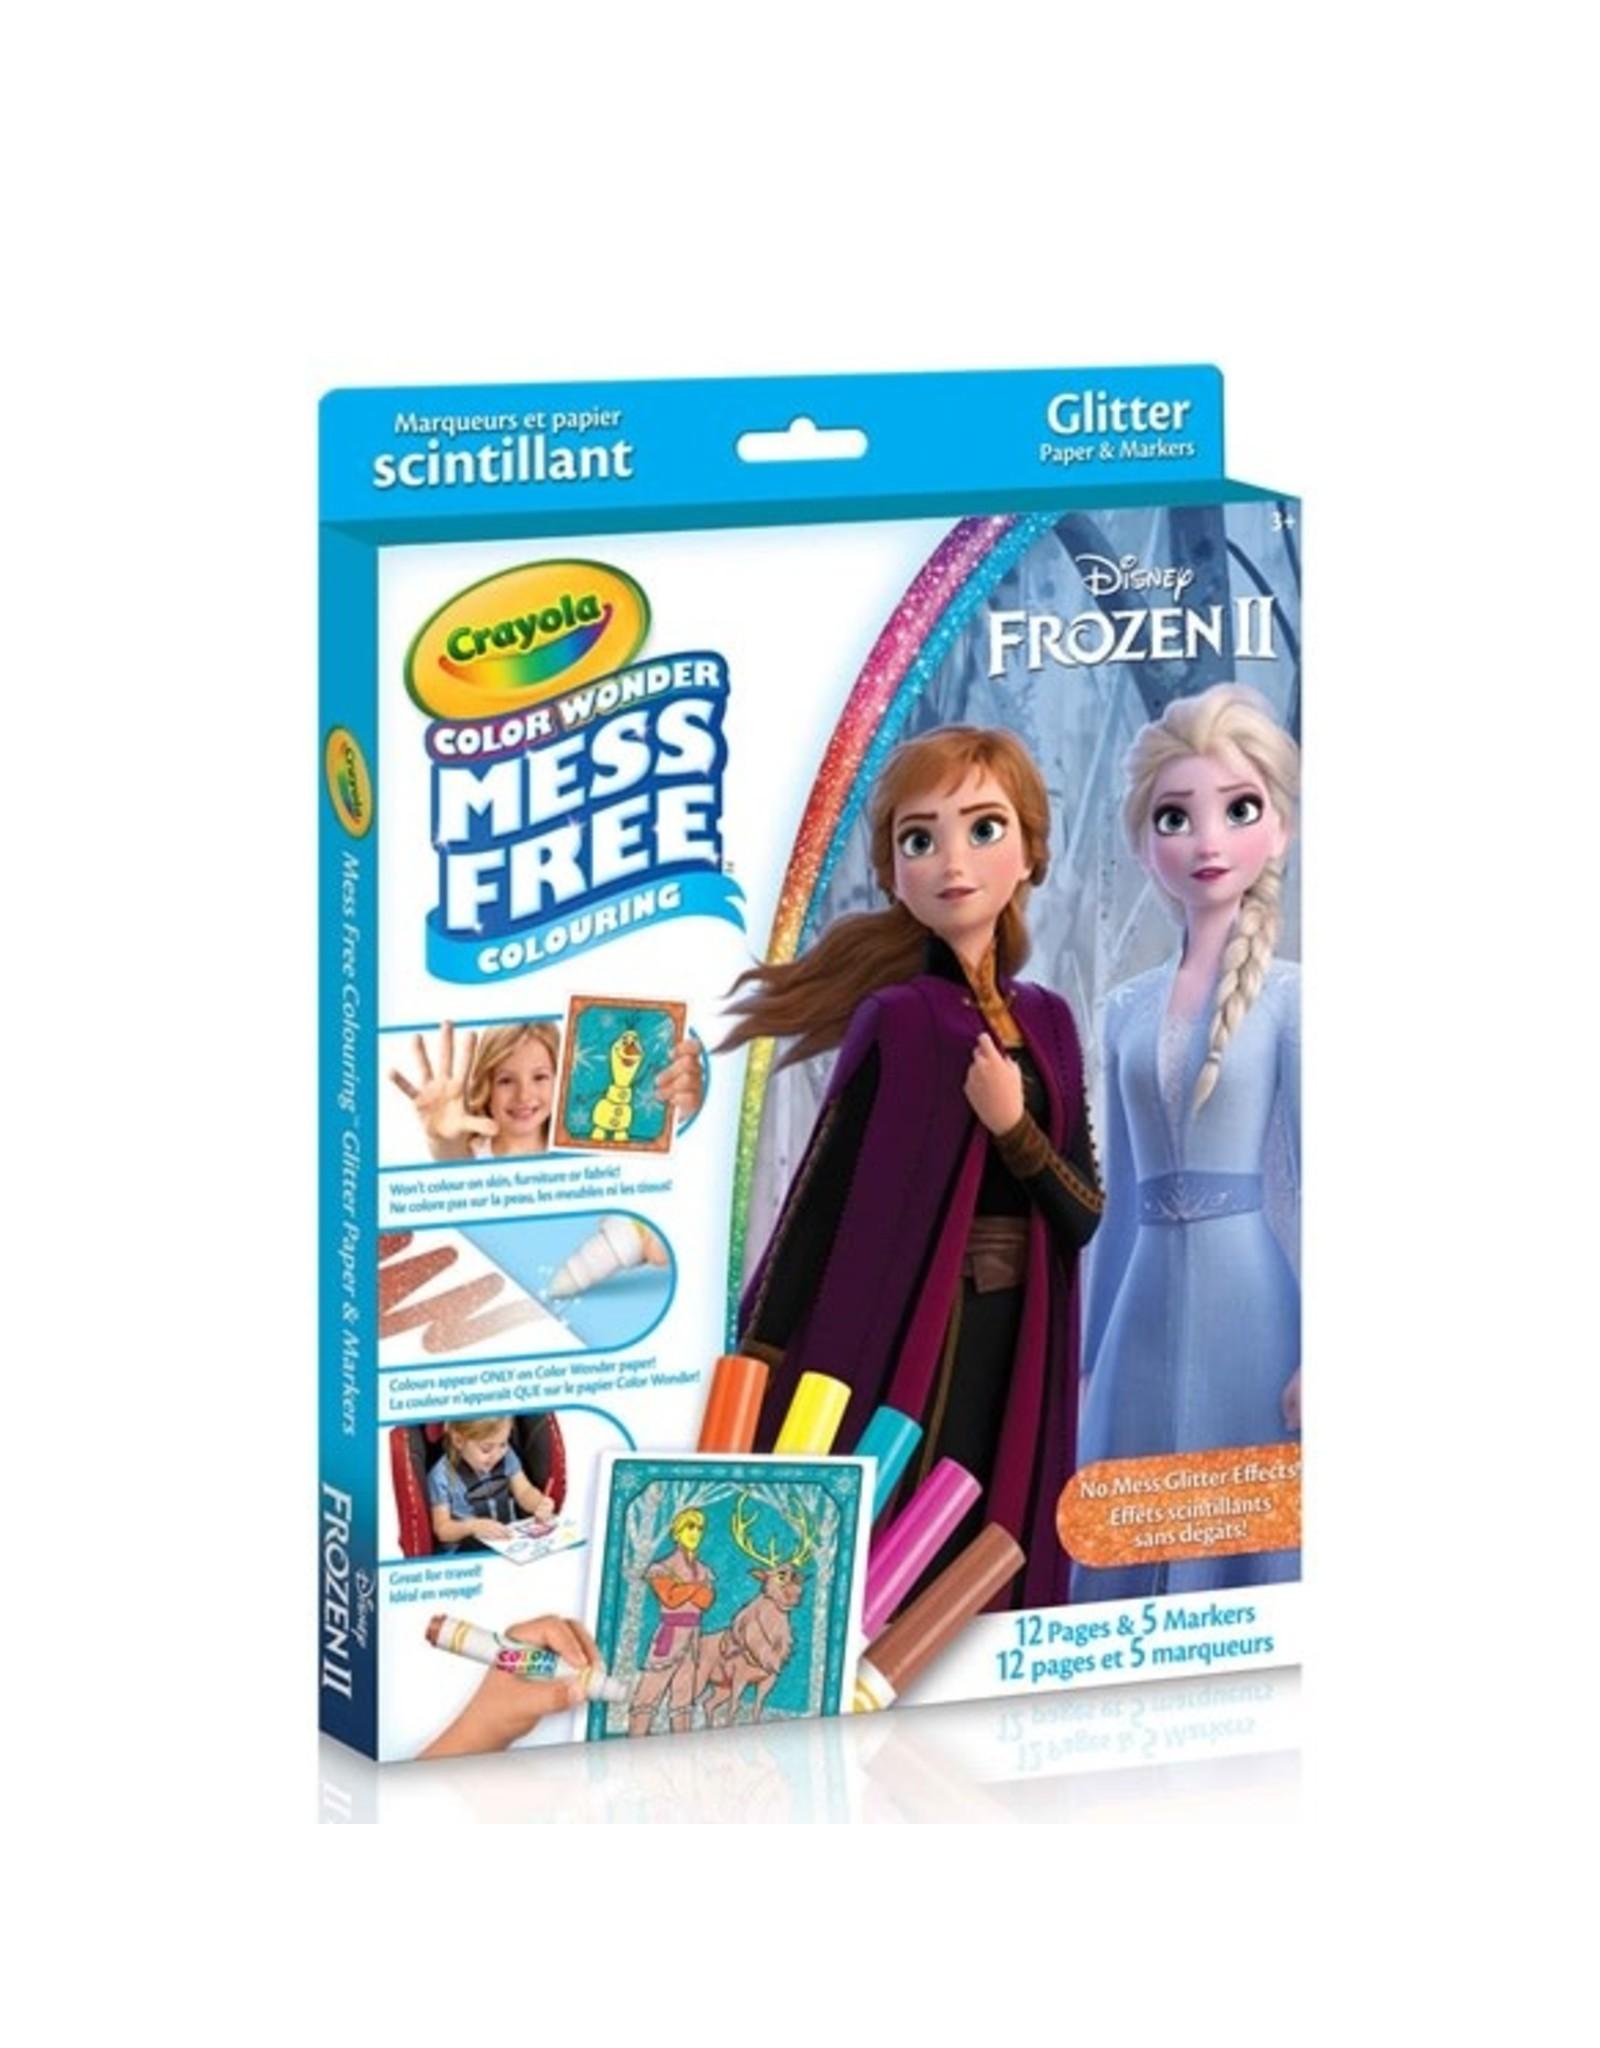 Crayola CW Glitter 12 pgs 5 mini mkr - Frozen 2